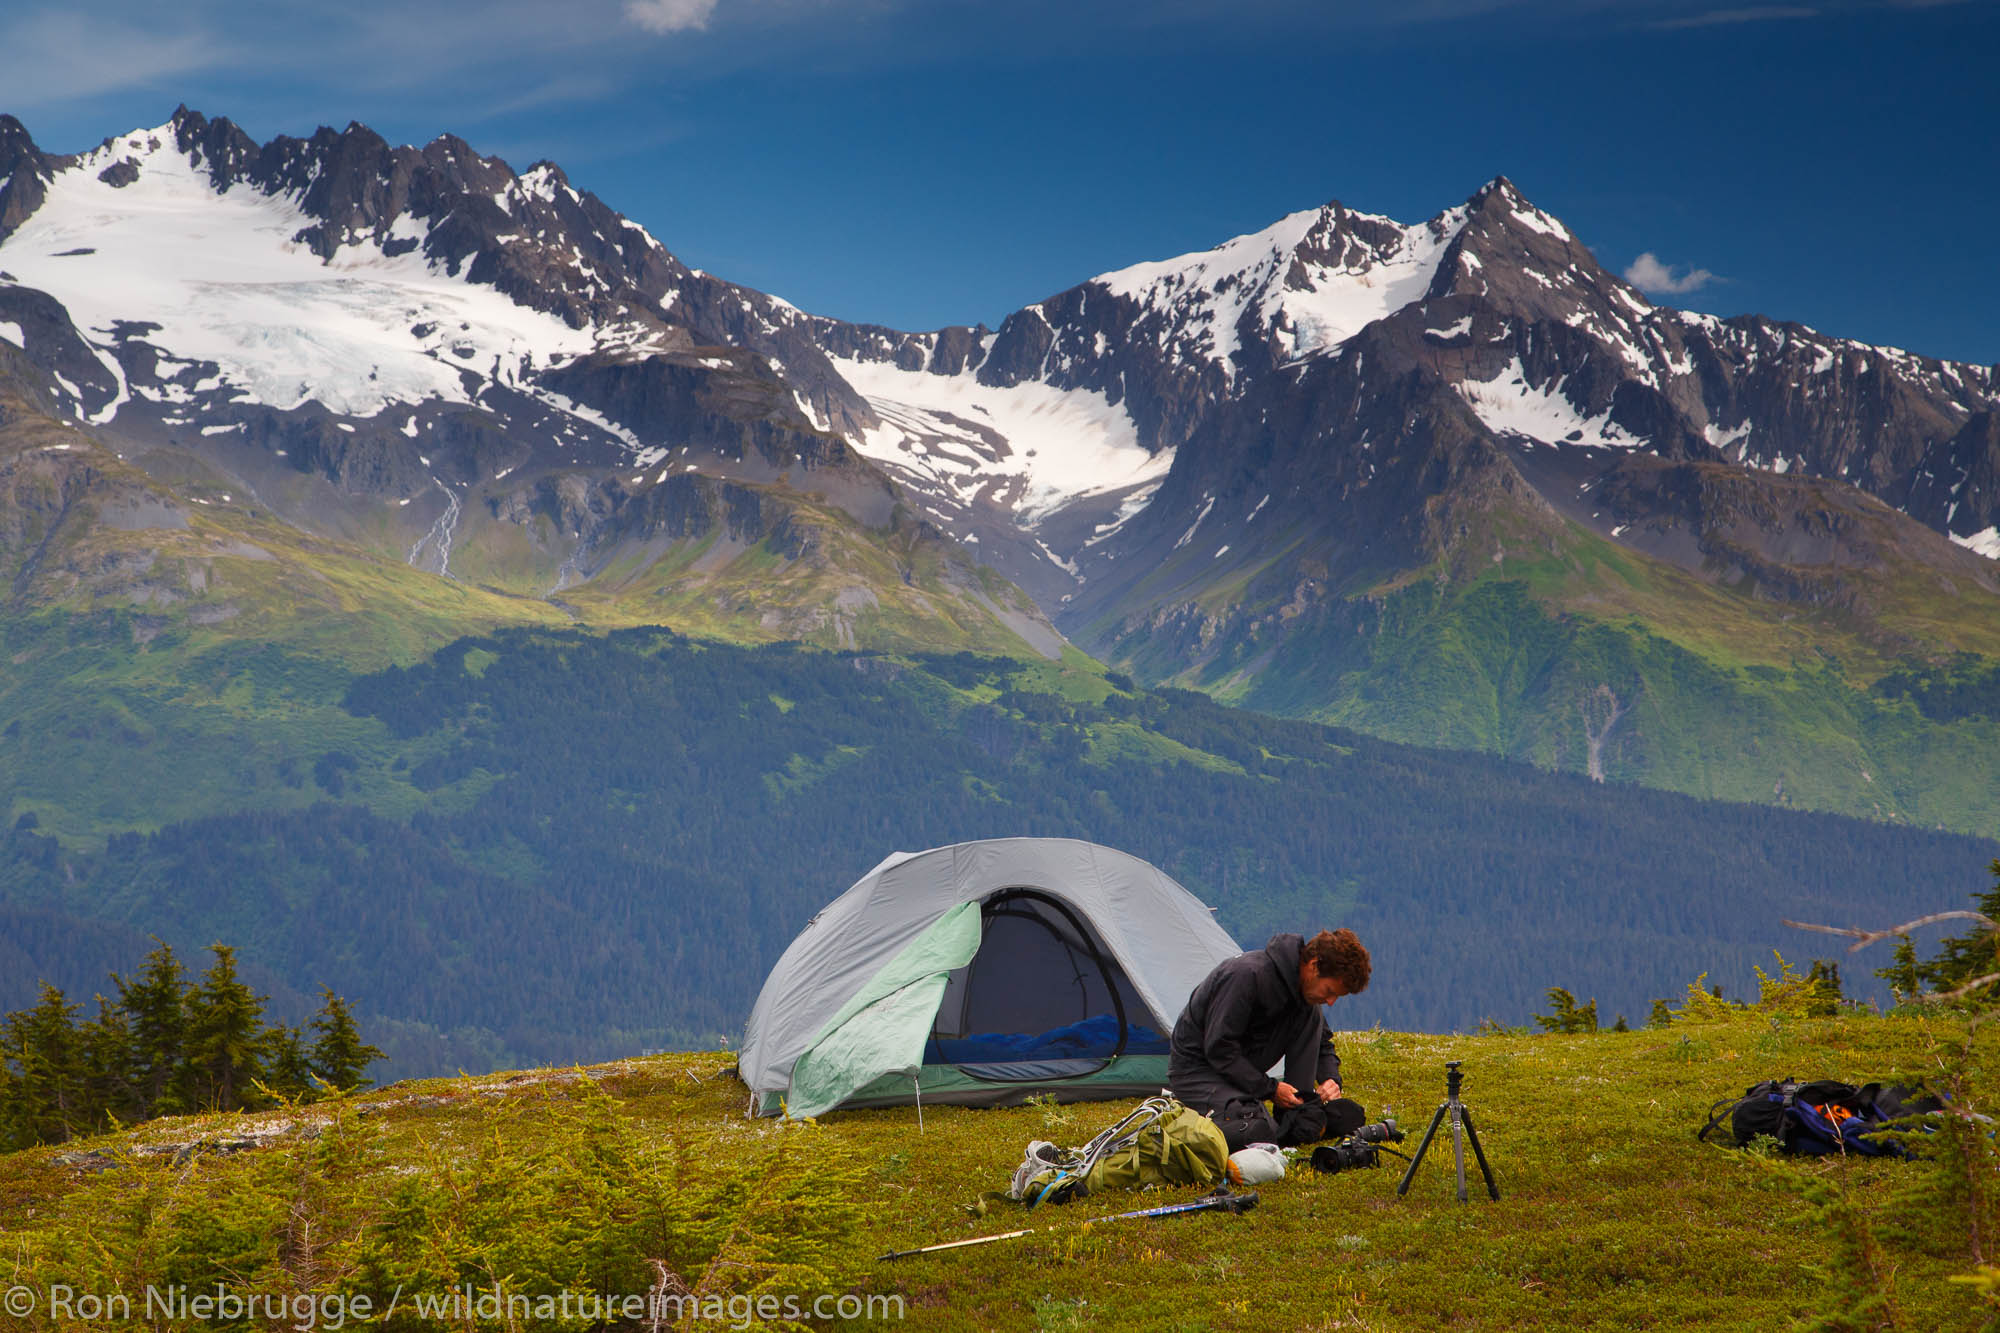 Backpacking along the Lost Lake Loop Trail, Chugach National Forest, Seward, Alaska. (model released)